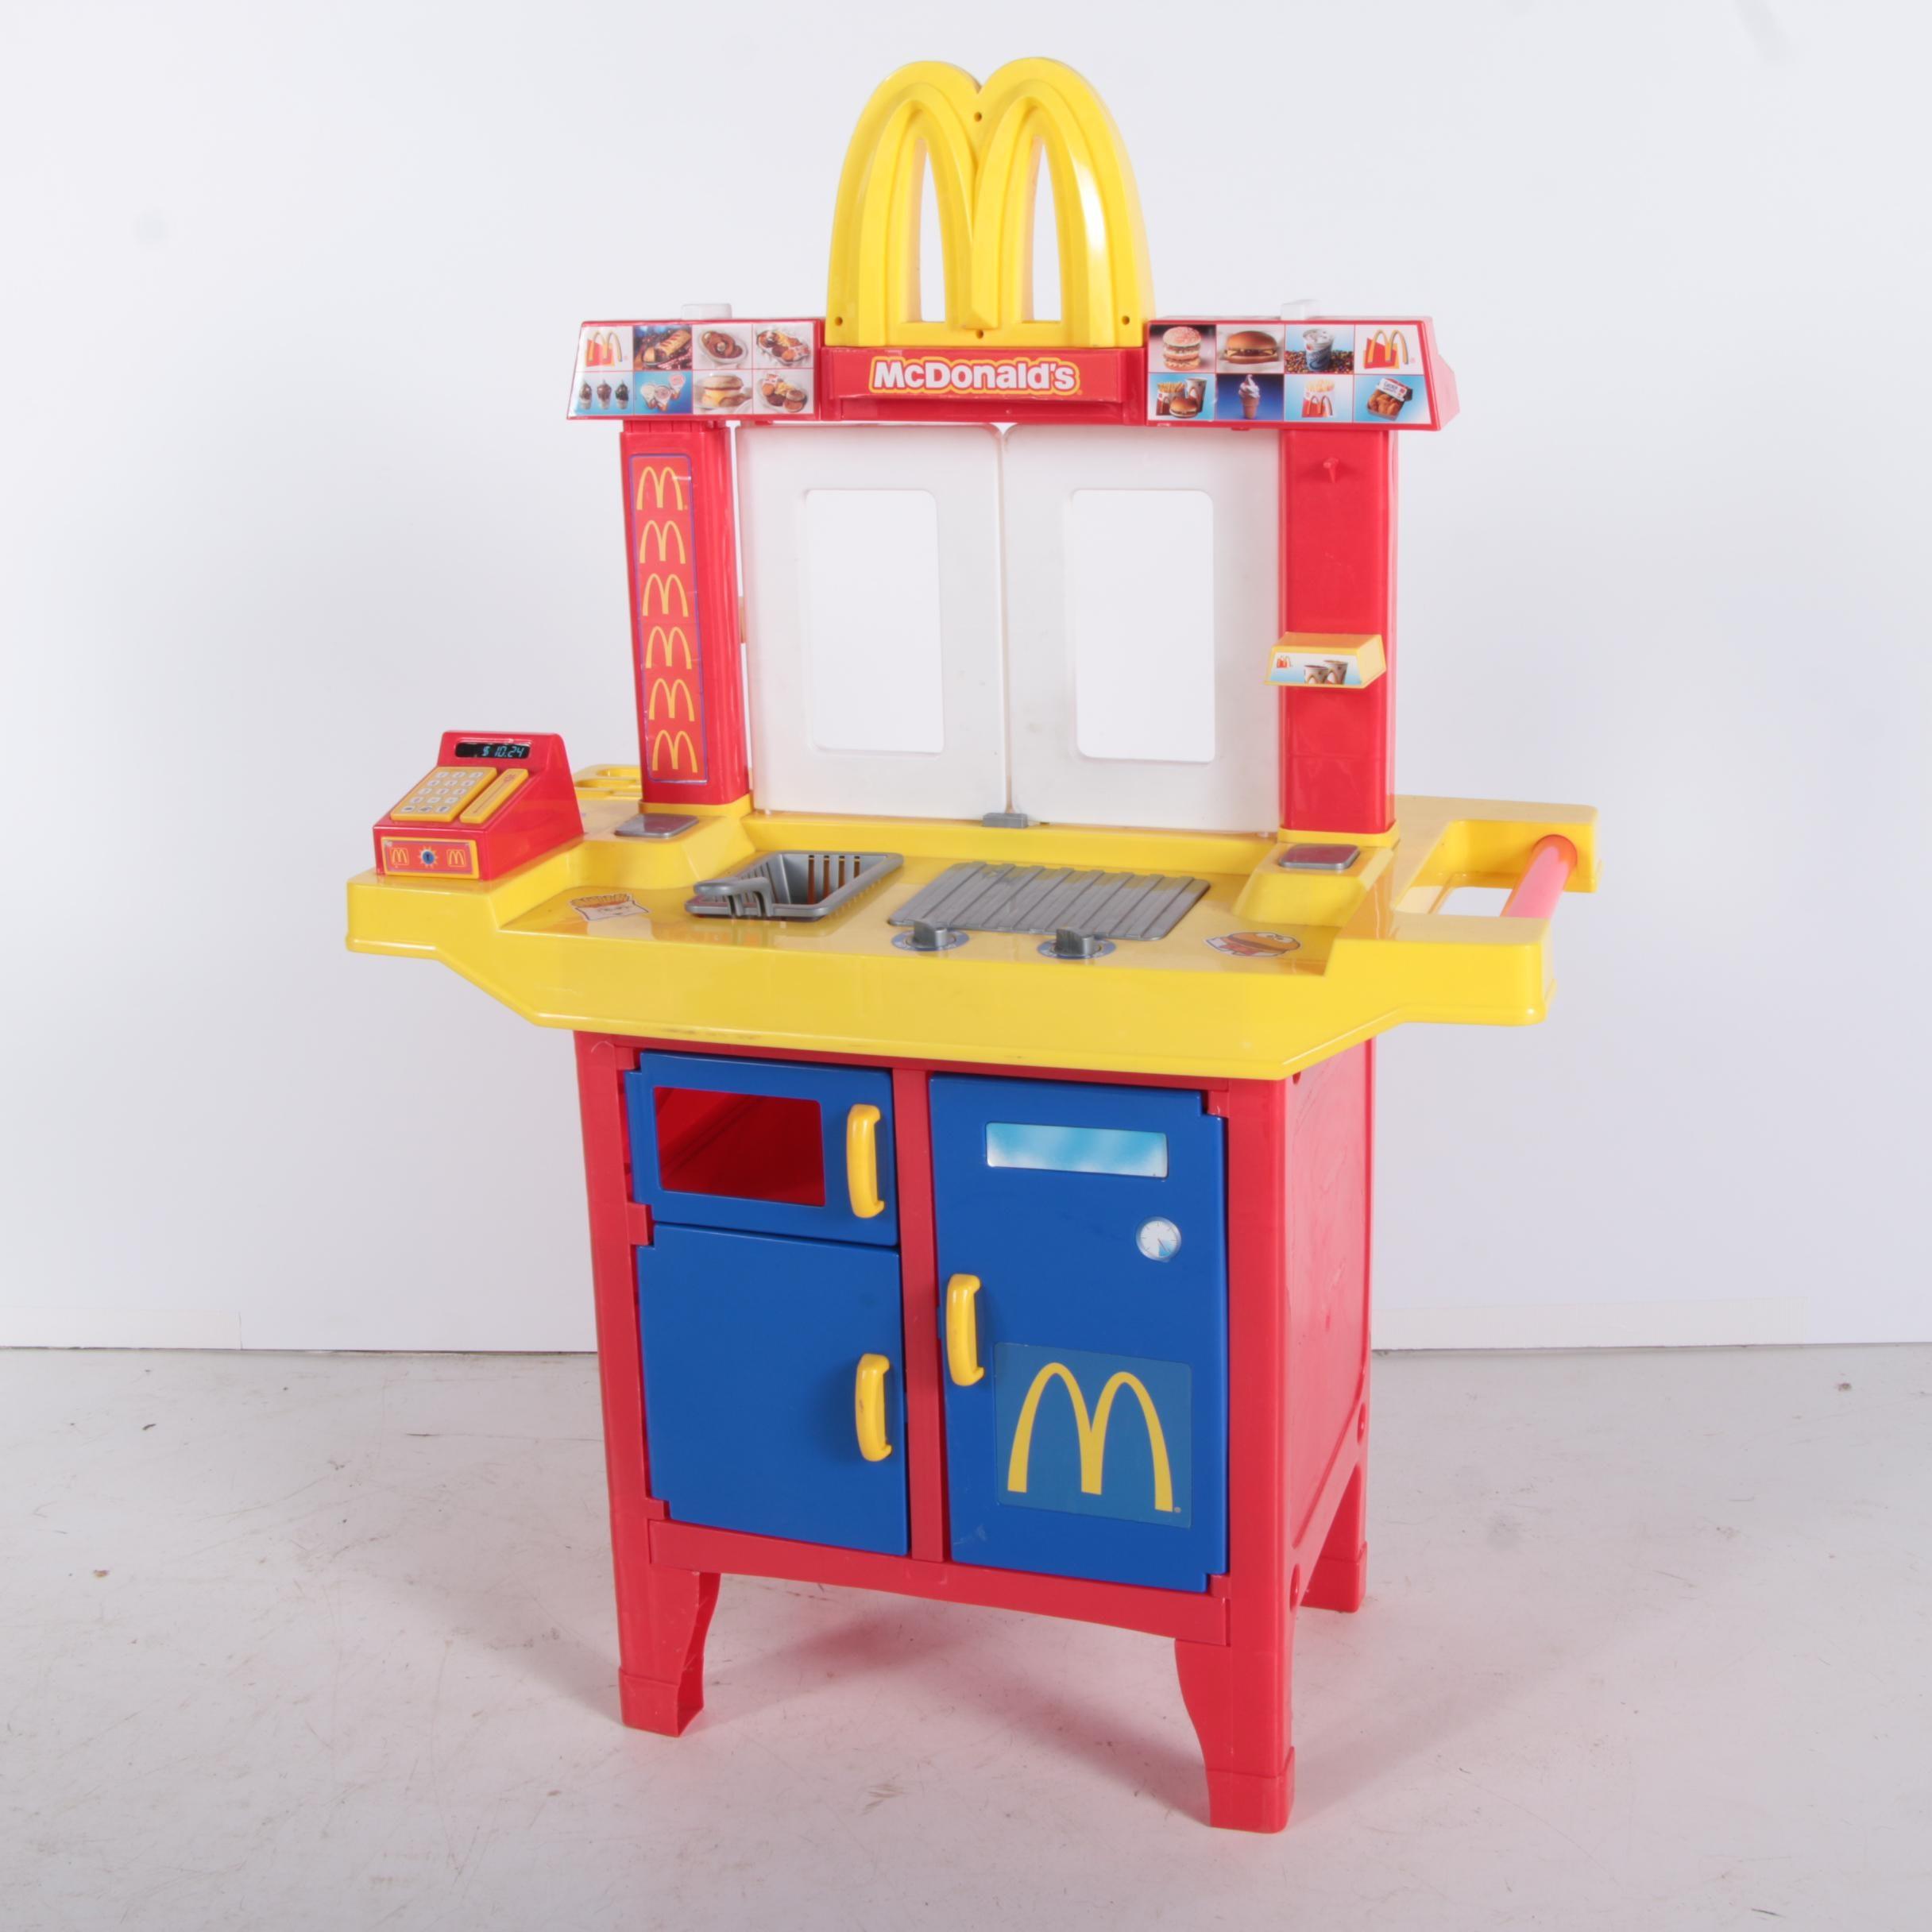 McDonaldu0027s Childrenu0027s Play Kitchen Set And Backpack ...